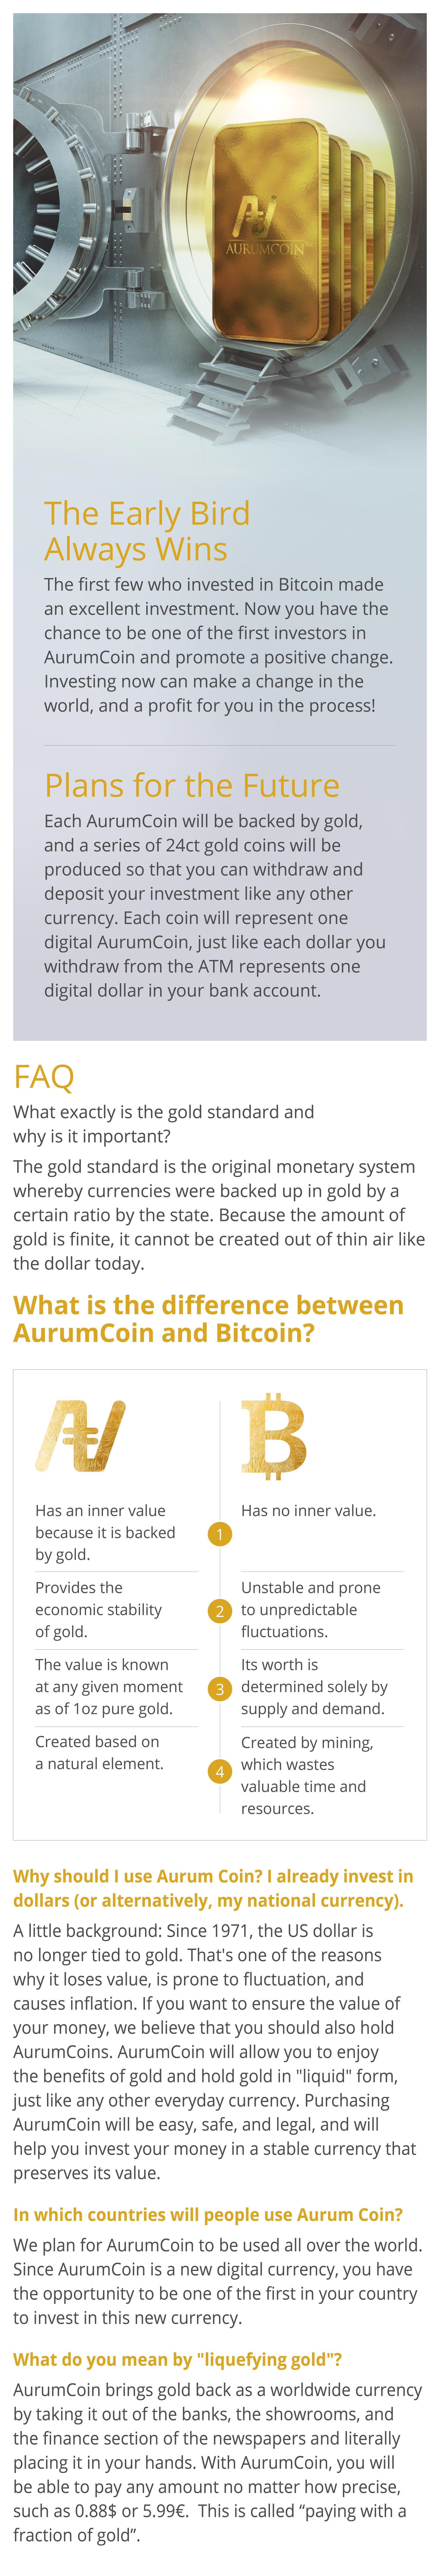 AurumCoin - One World One Coin